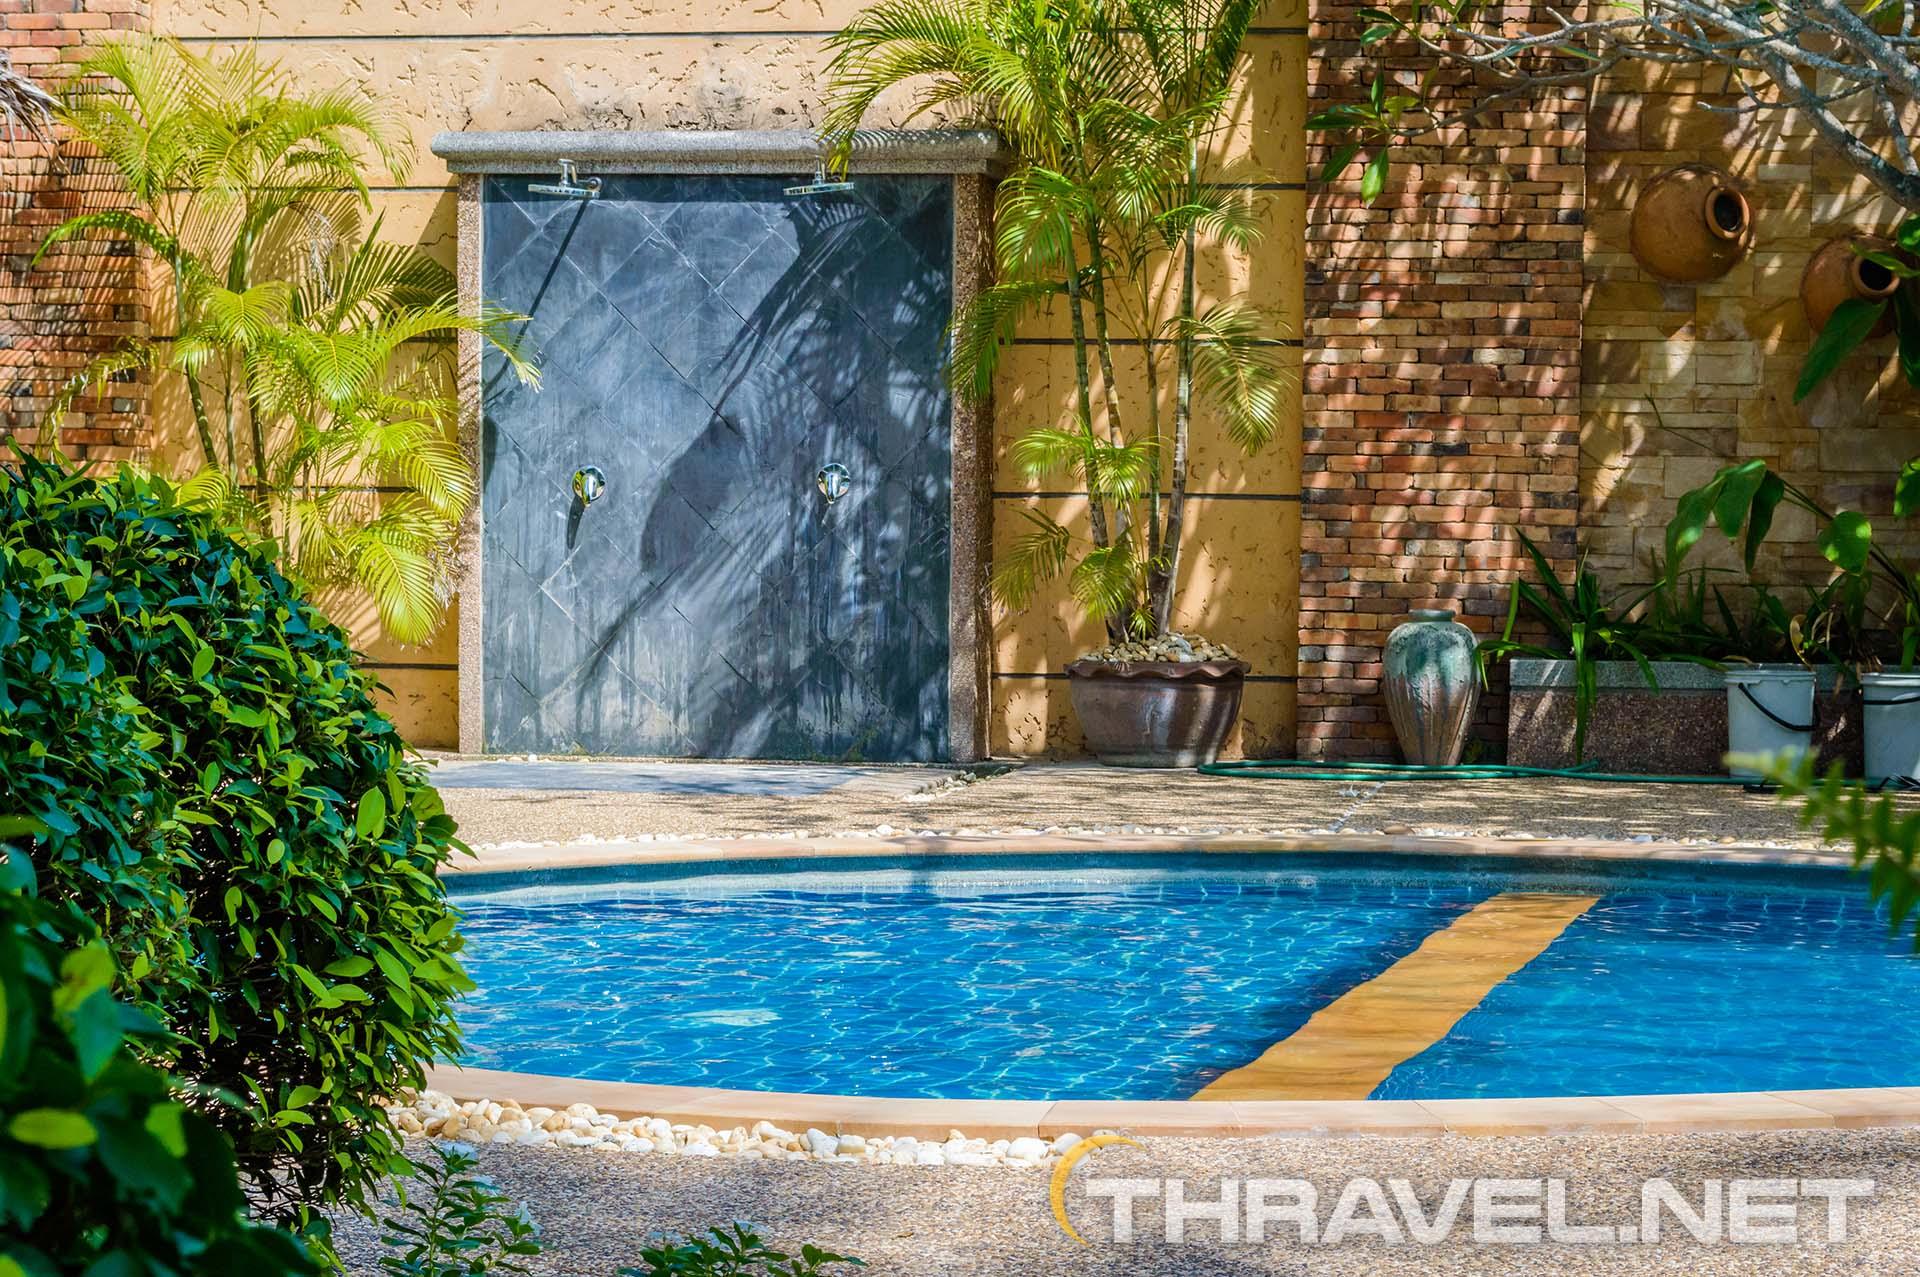 Railey-village-Krabi-pool